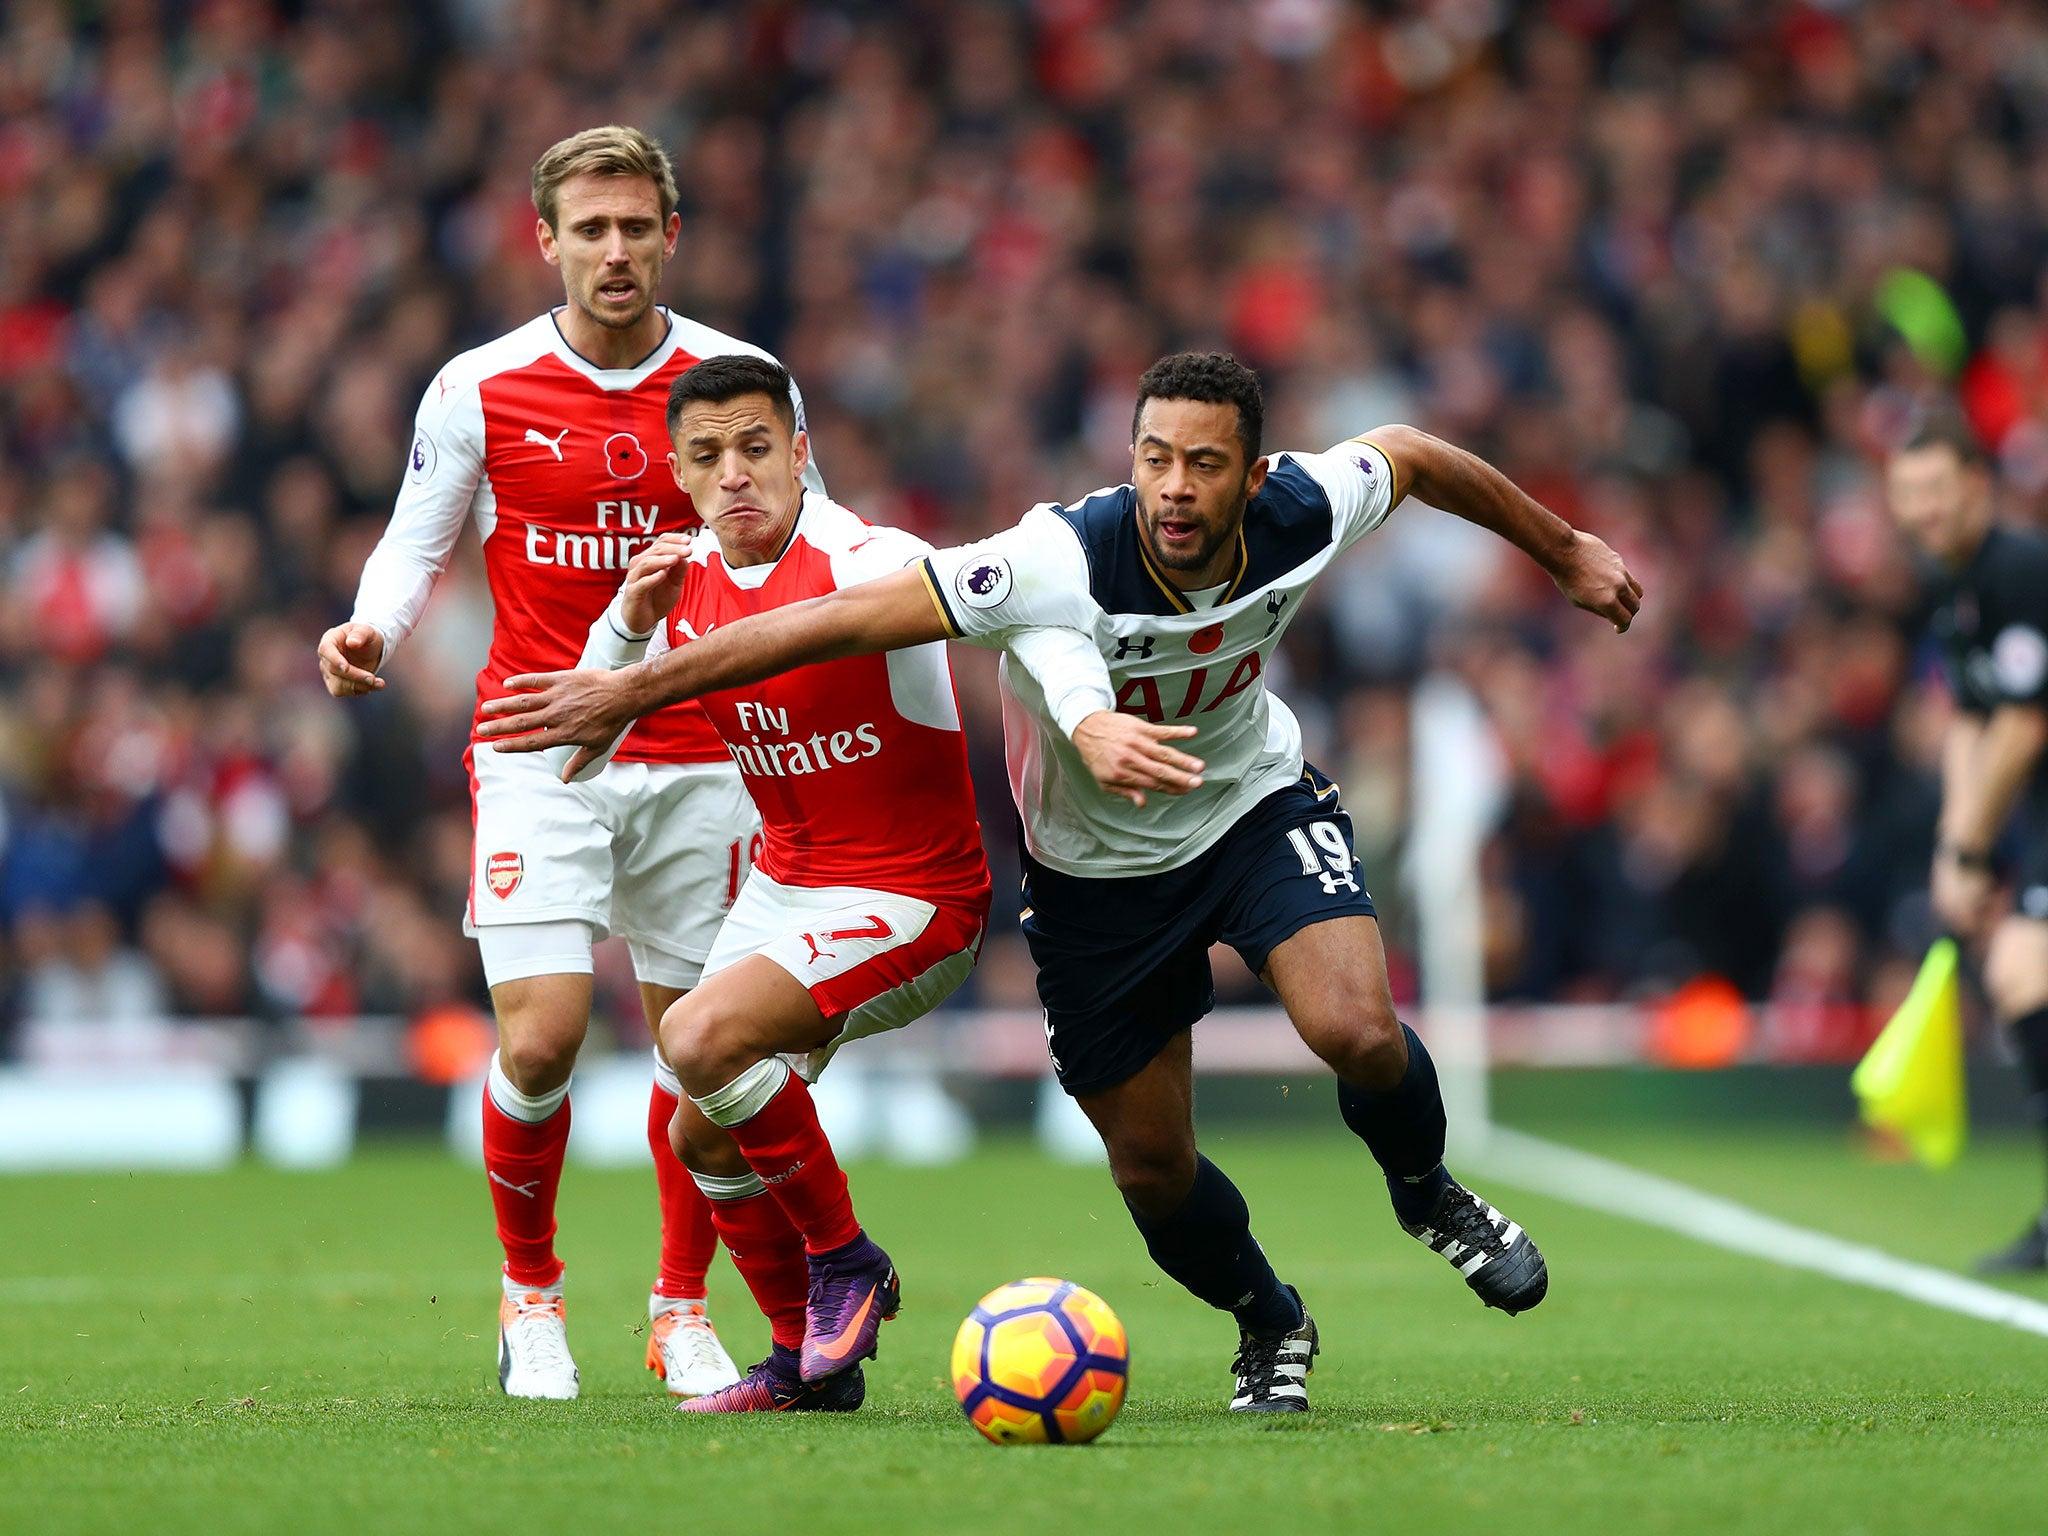 English Premier League Arsenal Vs Sporting Lisbon Live stream online watch Free TV Channel HD 25102018 live score Man city vs Arsenal time lineups